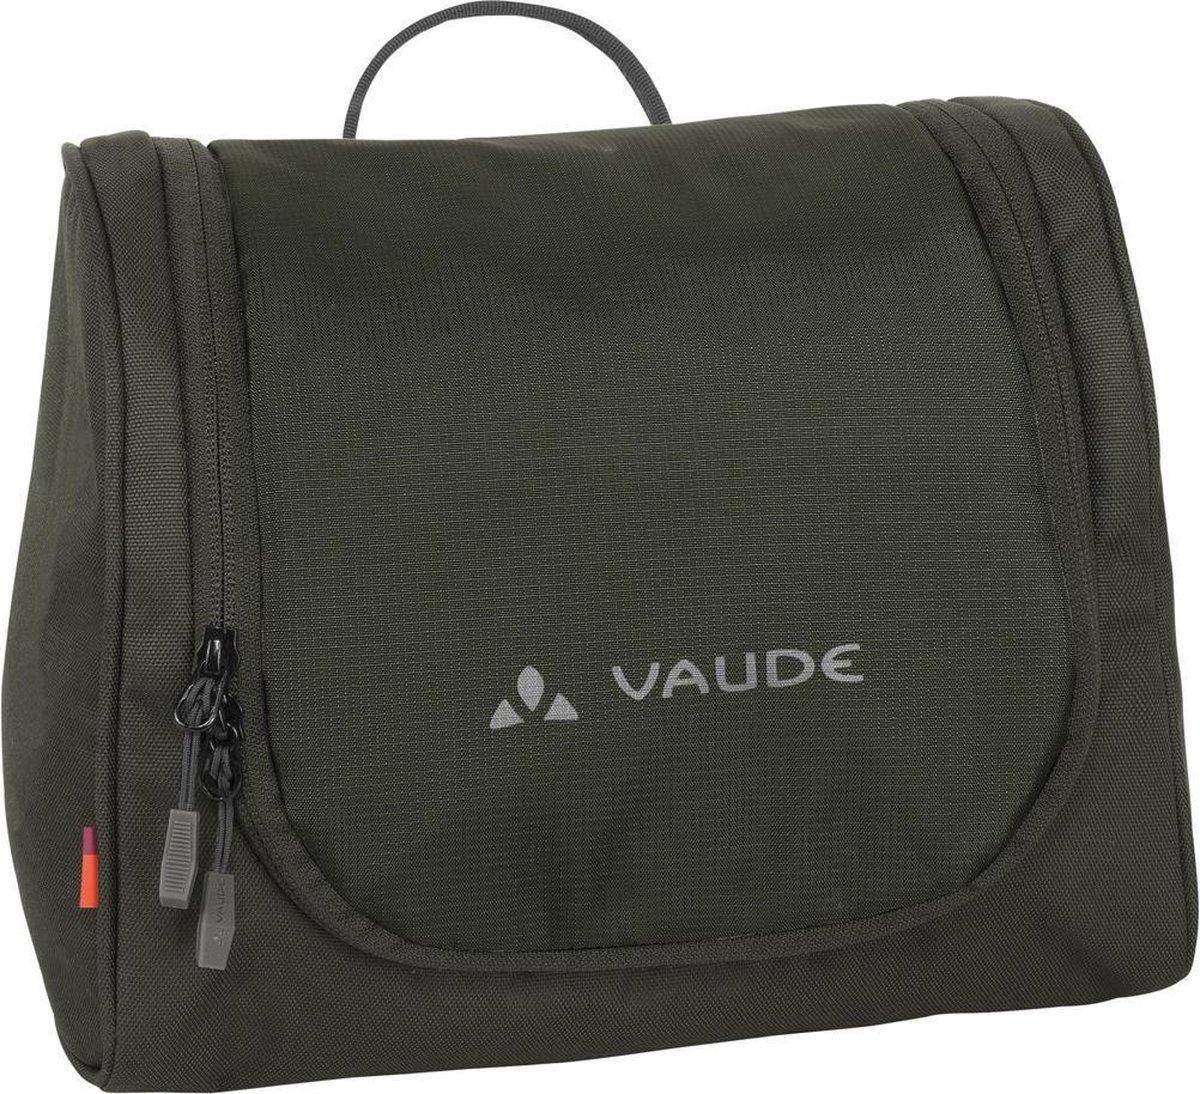 Vaude Tecowash - Toilettas - 5,5 liter - Unisex - olive - Vaude